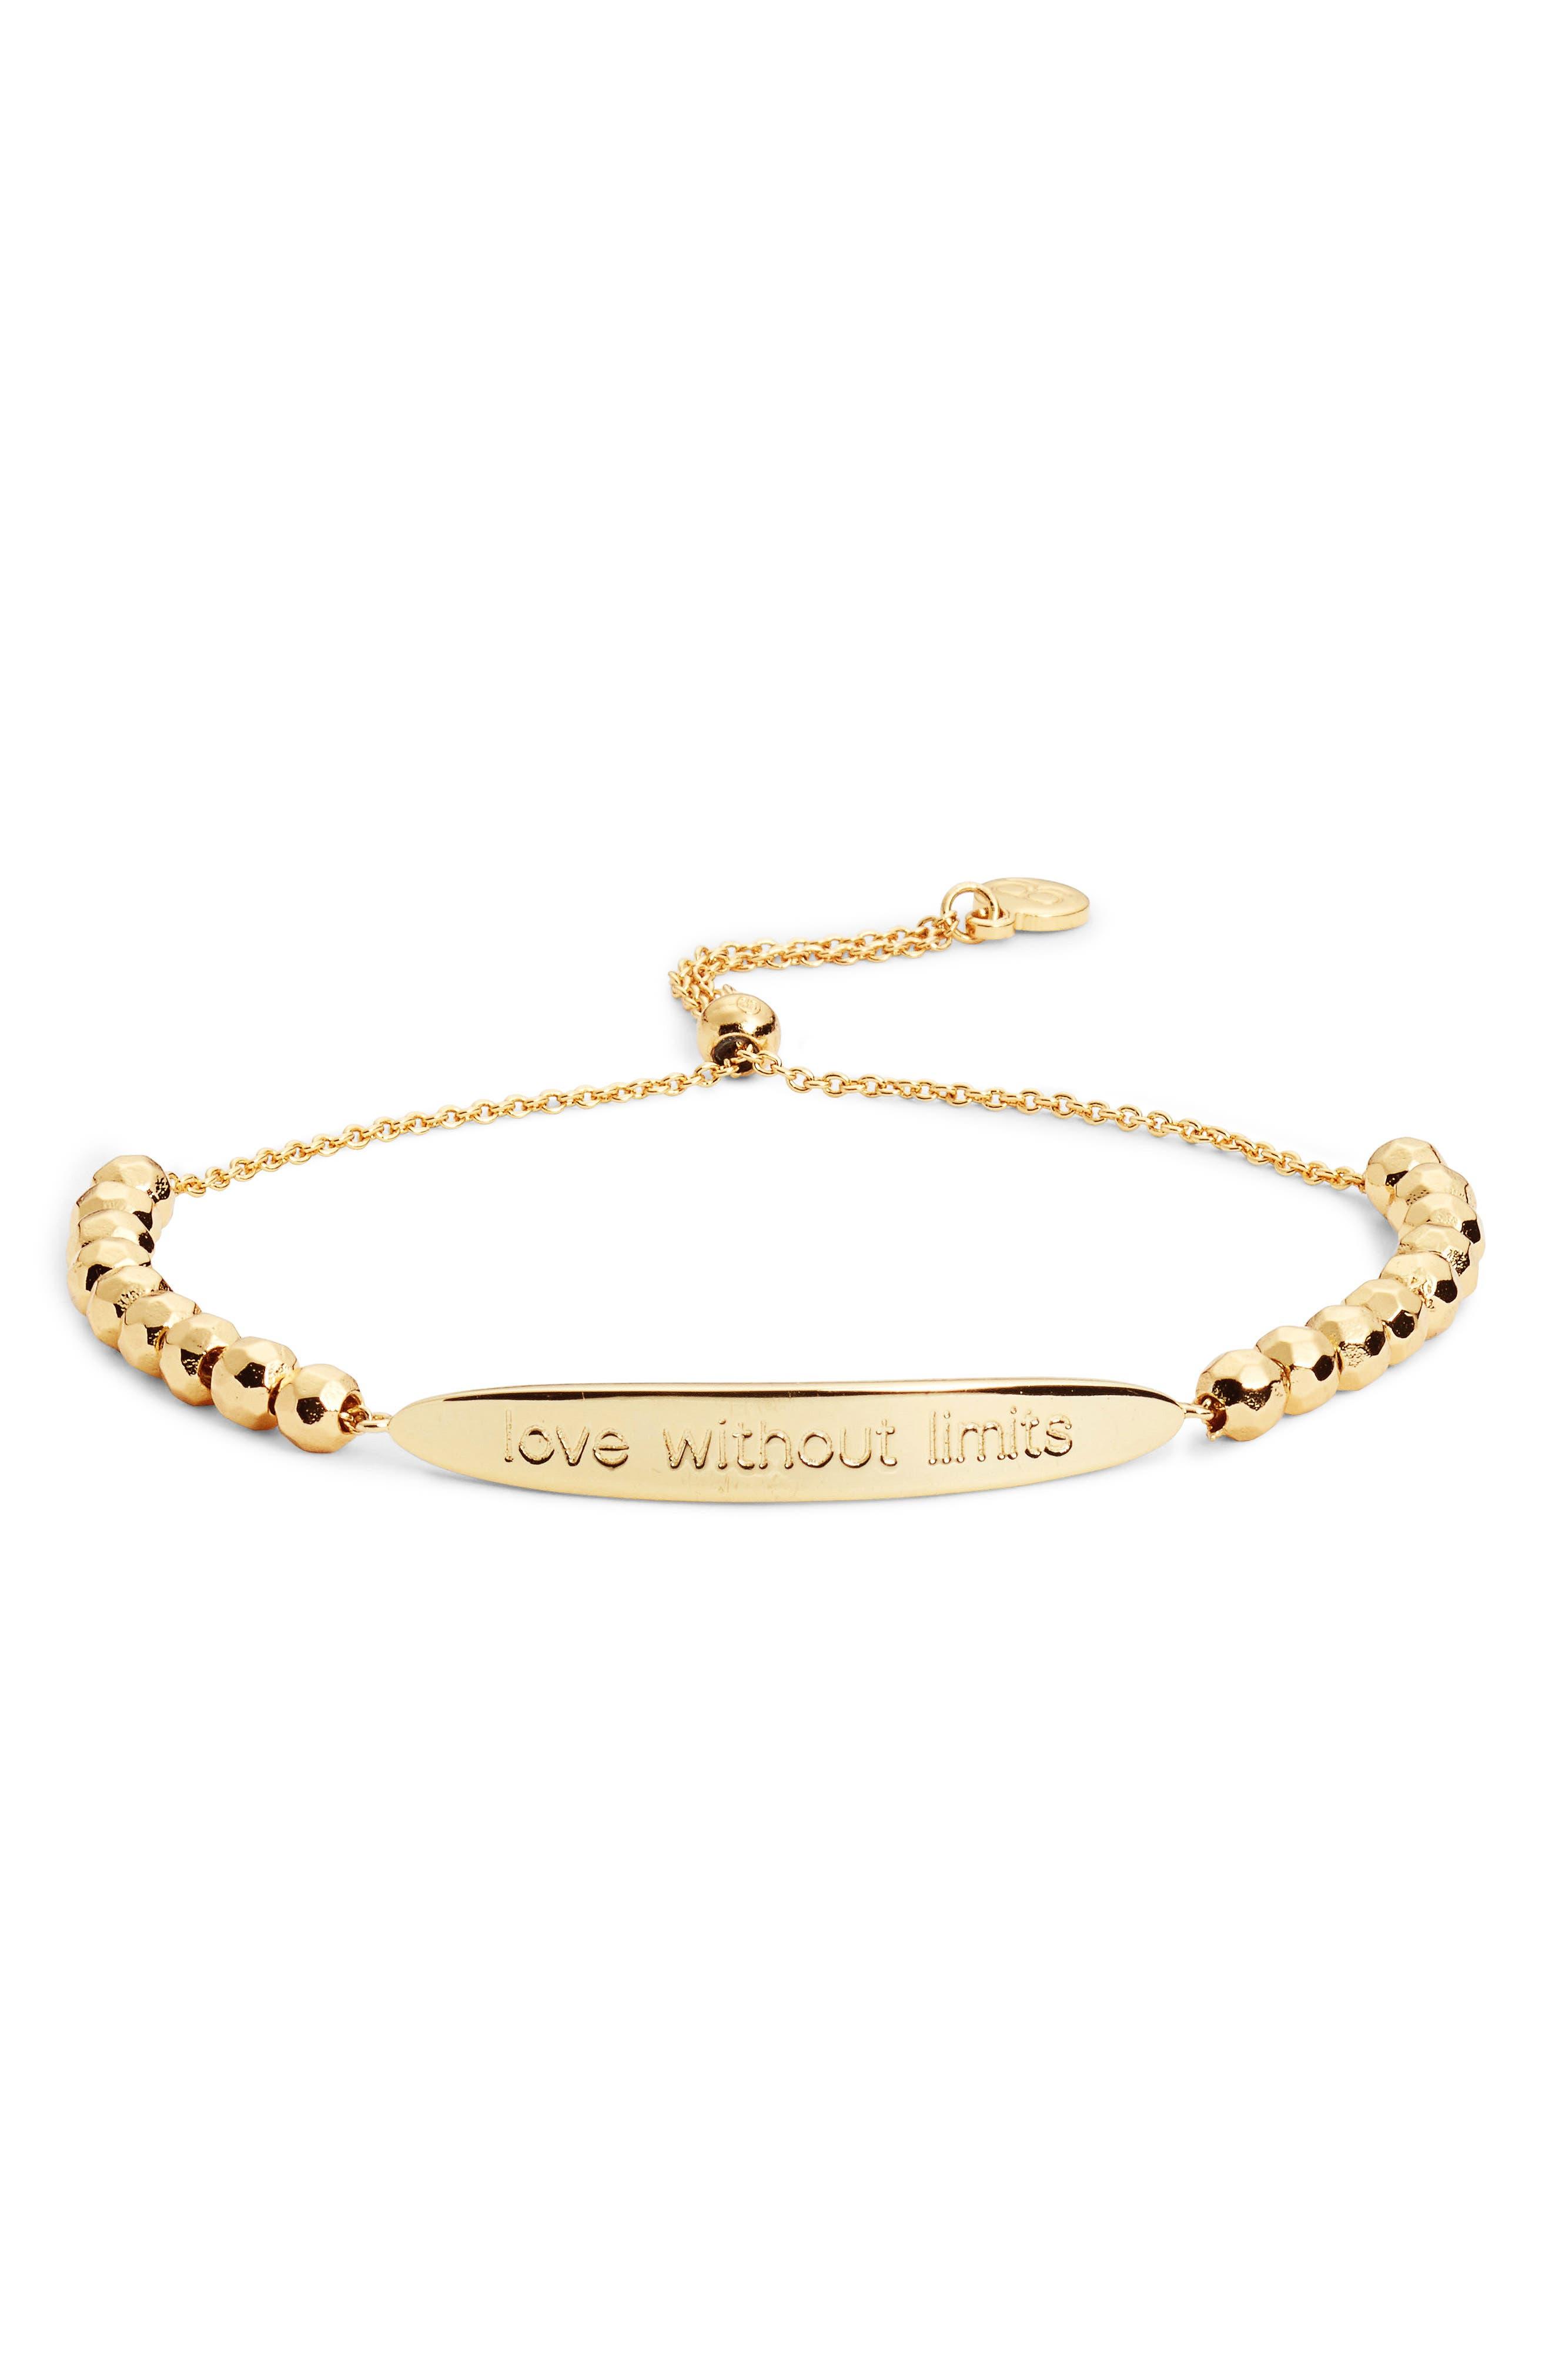 Power Intention Love without Limits Bracelet,                         Main,                         color, Gold